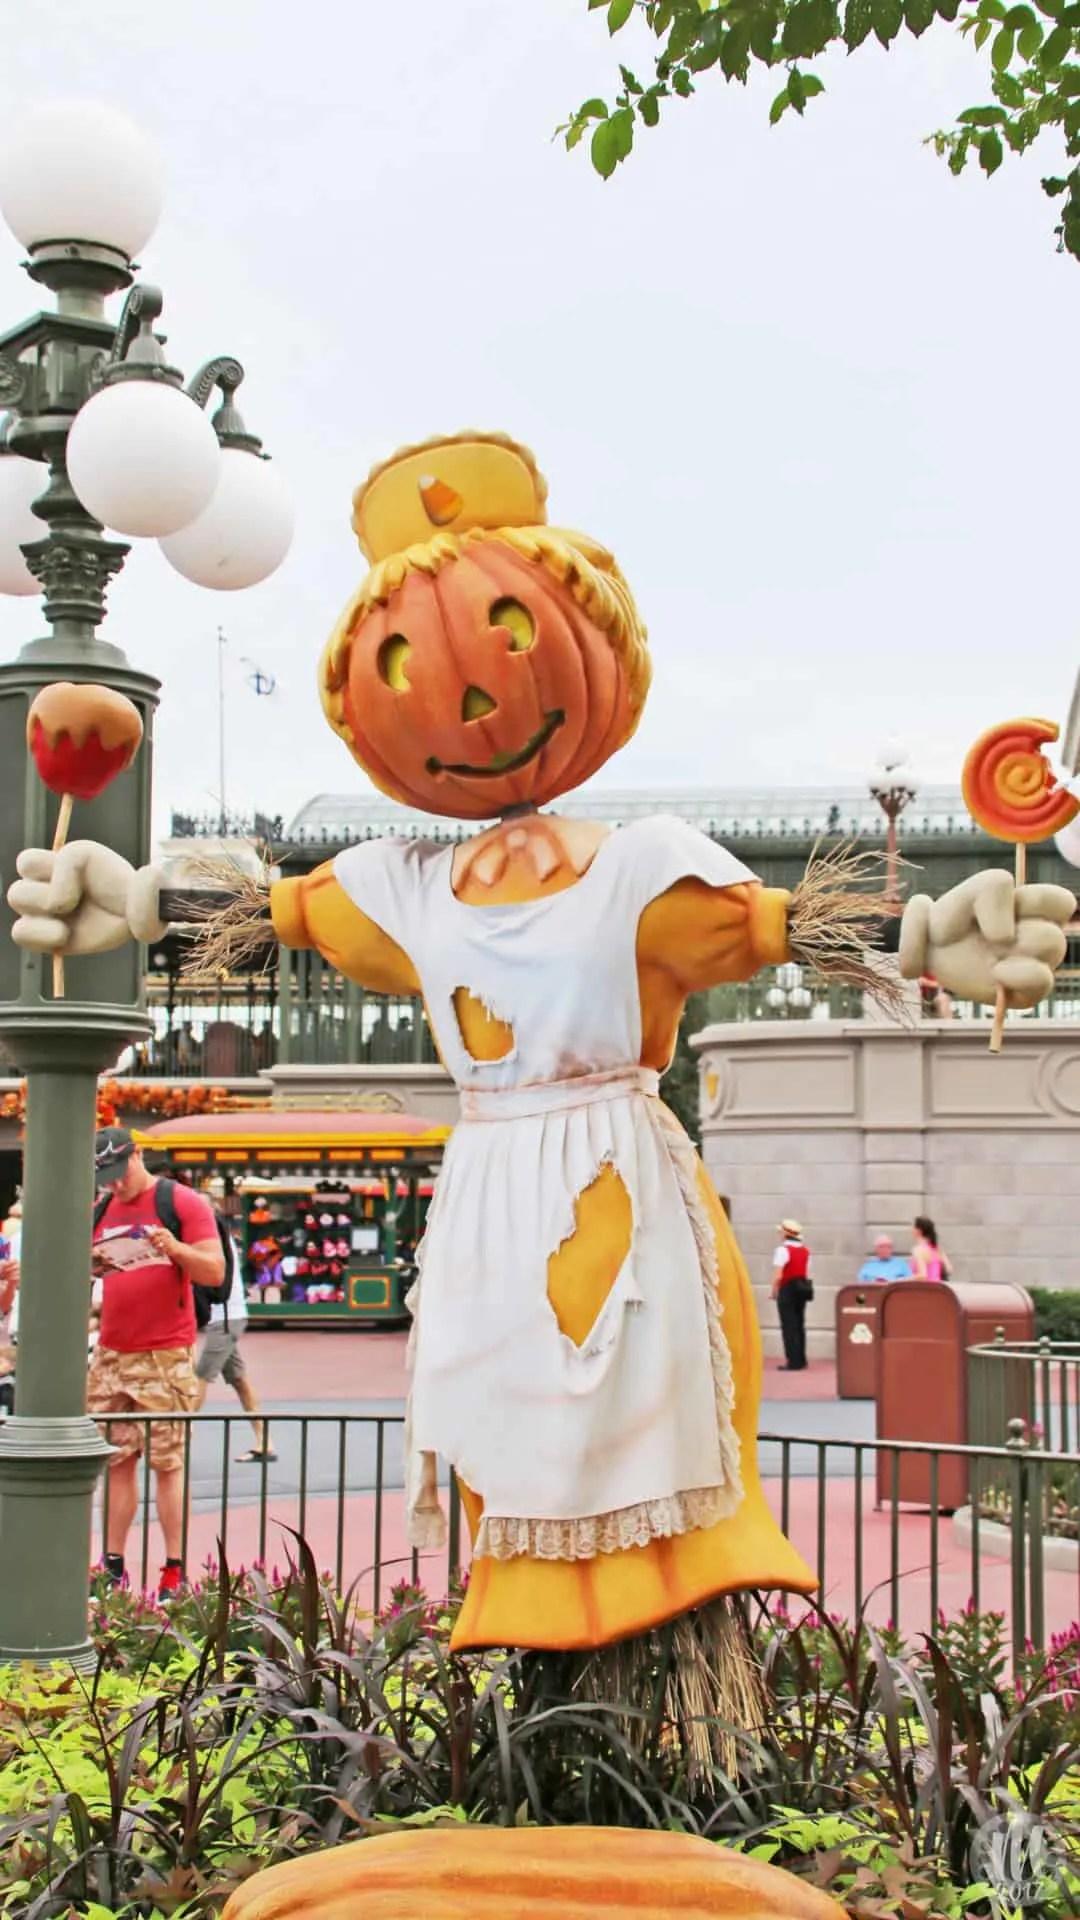 Disney Halloween iPhone Wallpapers - Candy Apple Scarecrow